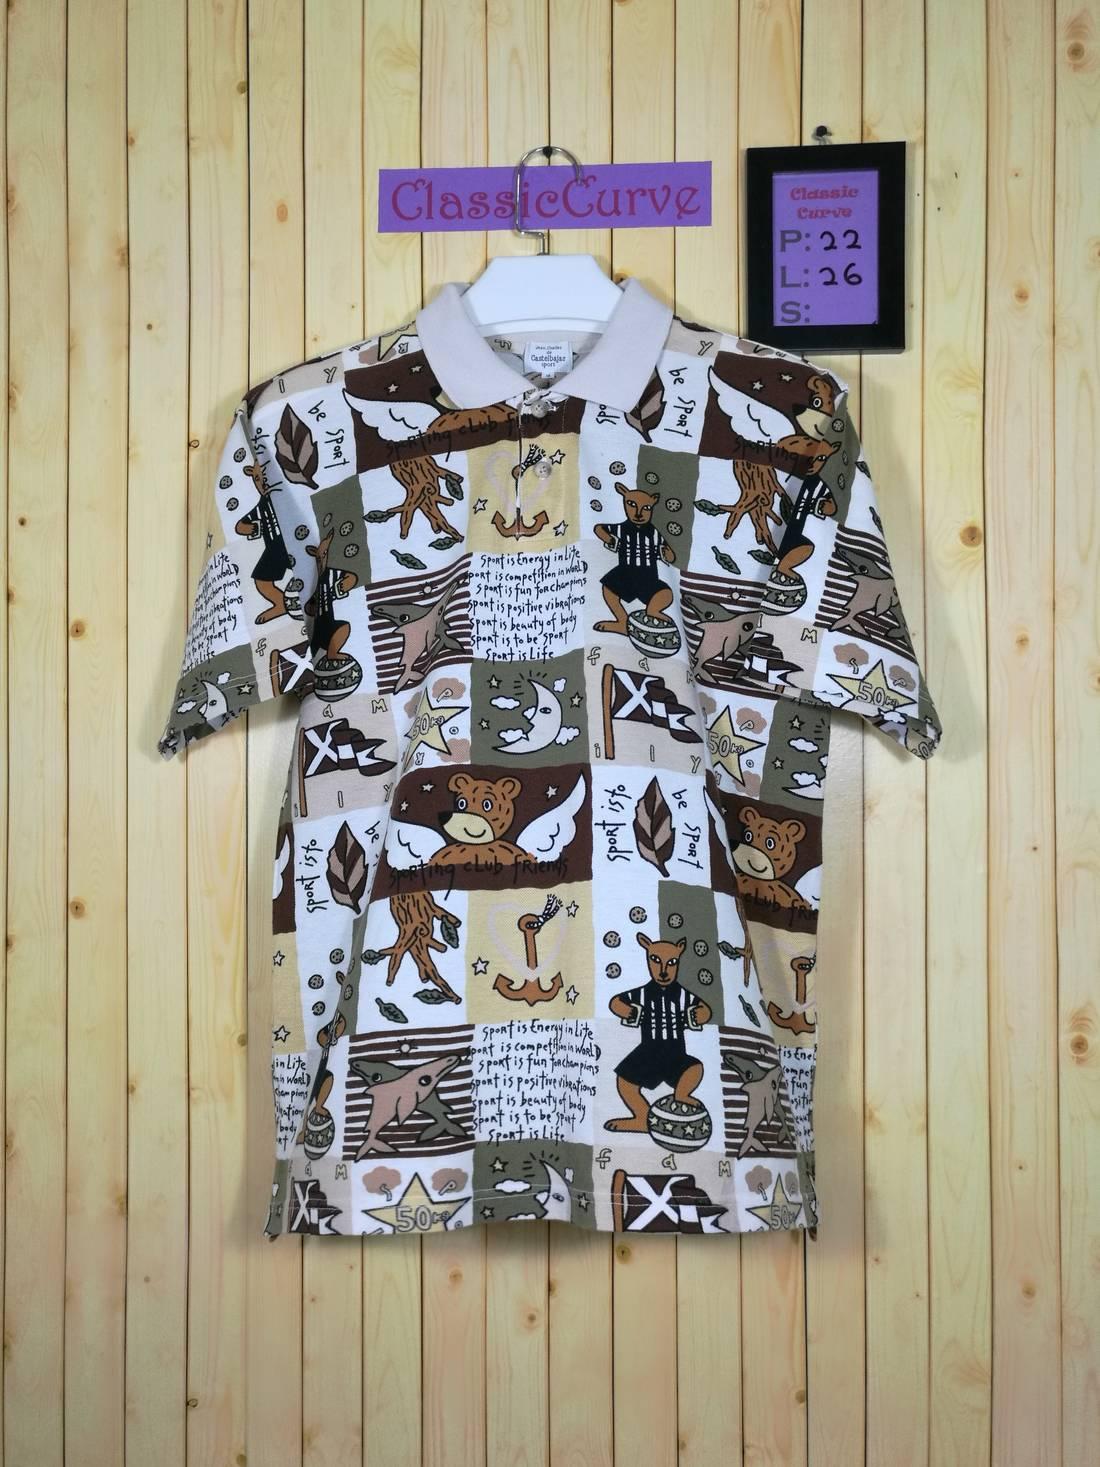 SALE!! Jc De CastelBajac Fullprint Tshirt Nice Design Size S xlhNfa